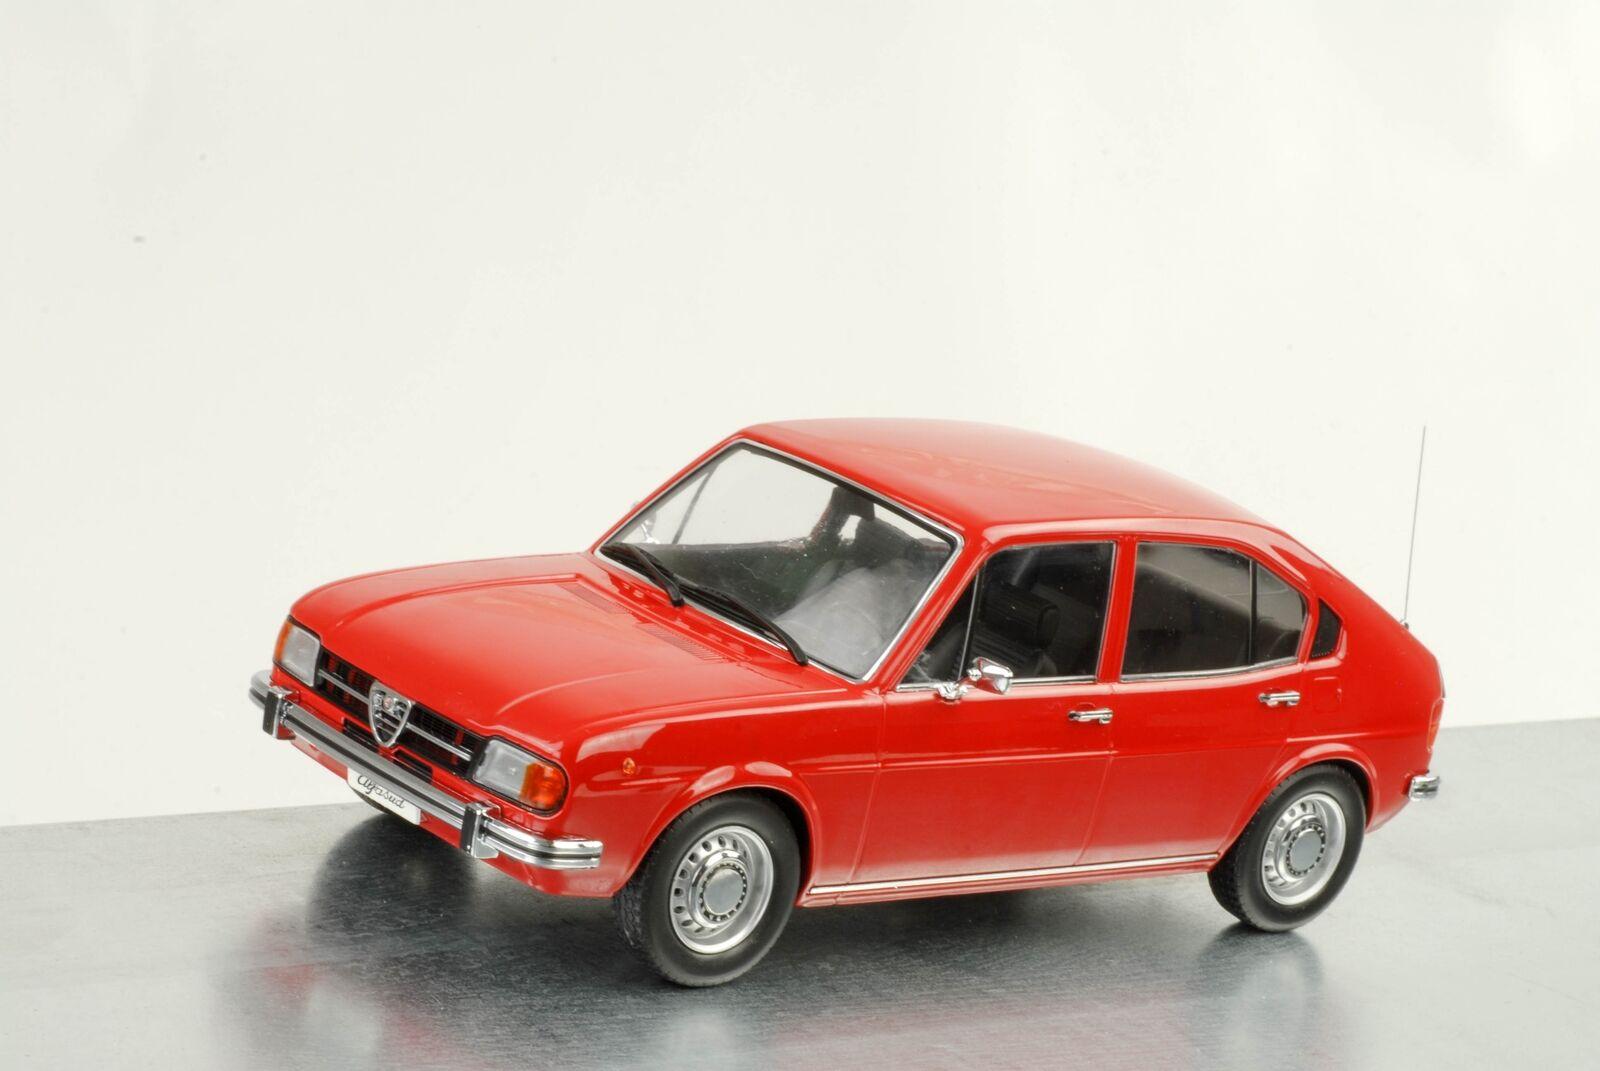 Alfa Romeo Romeo Romeo Alfasud 1974 1.3 Rojo 1 18 Kk Scale Diecast 1e57bc